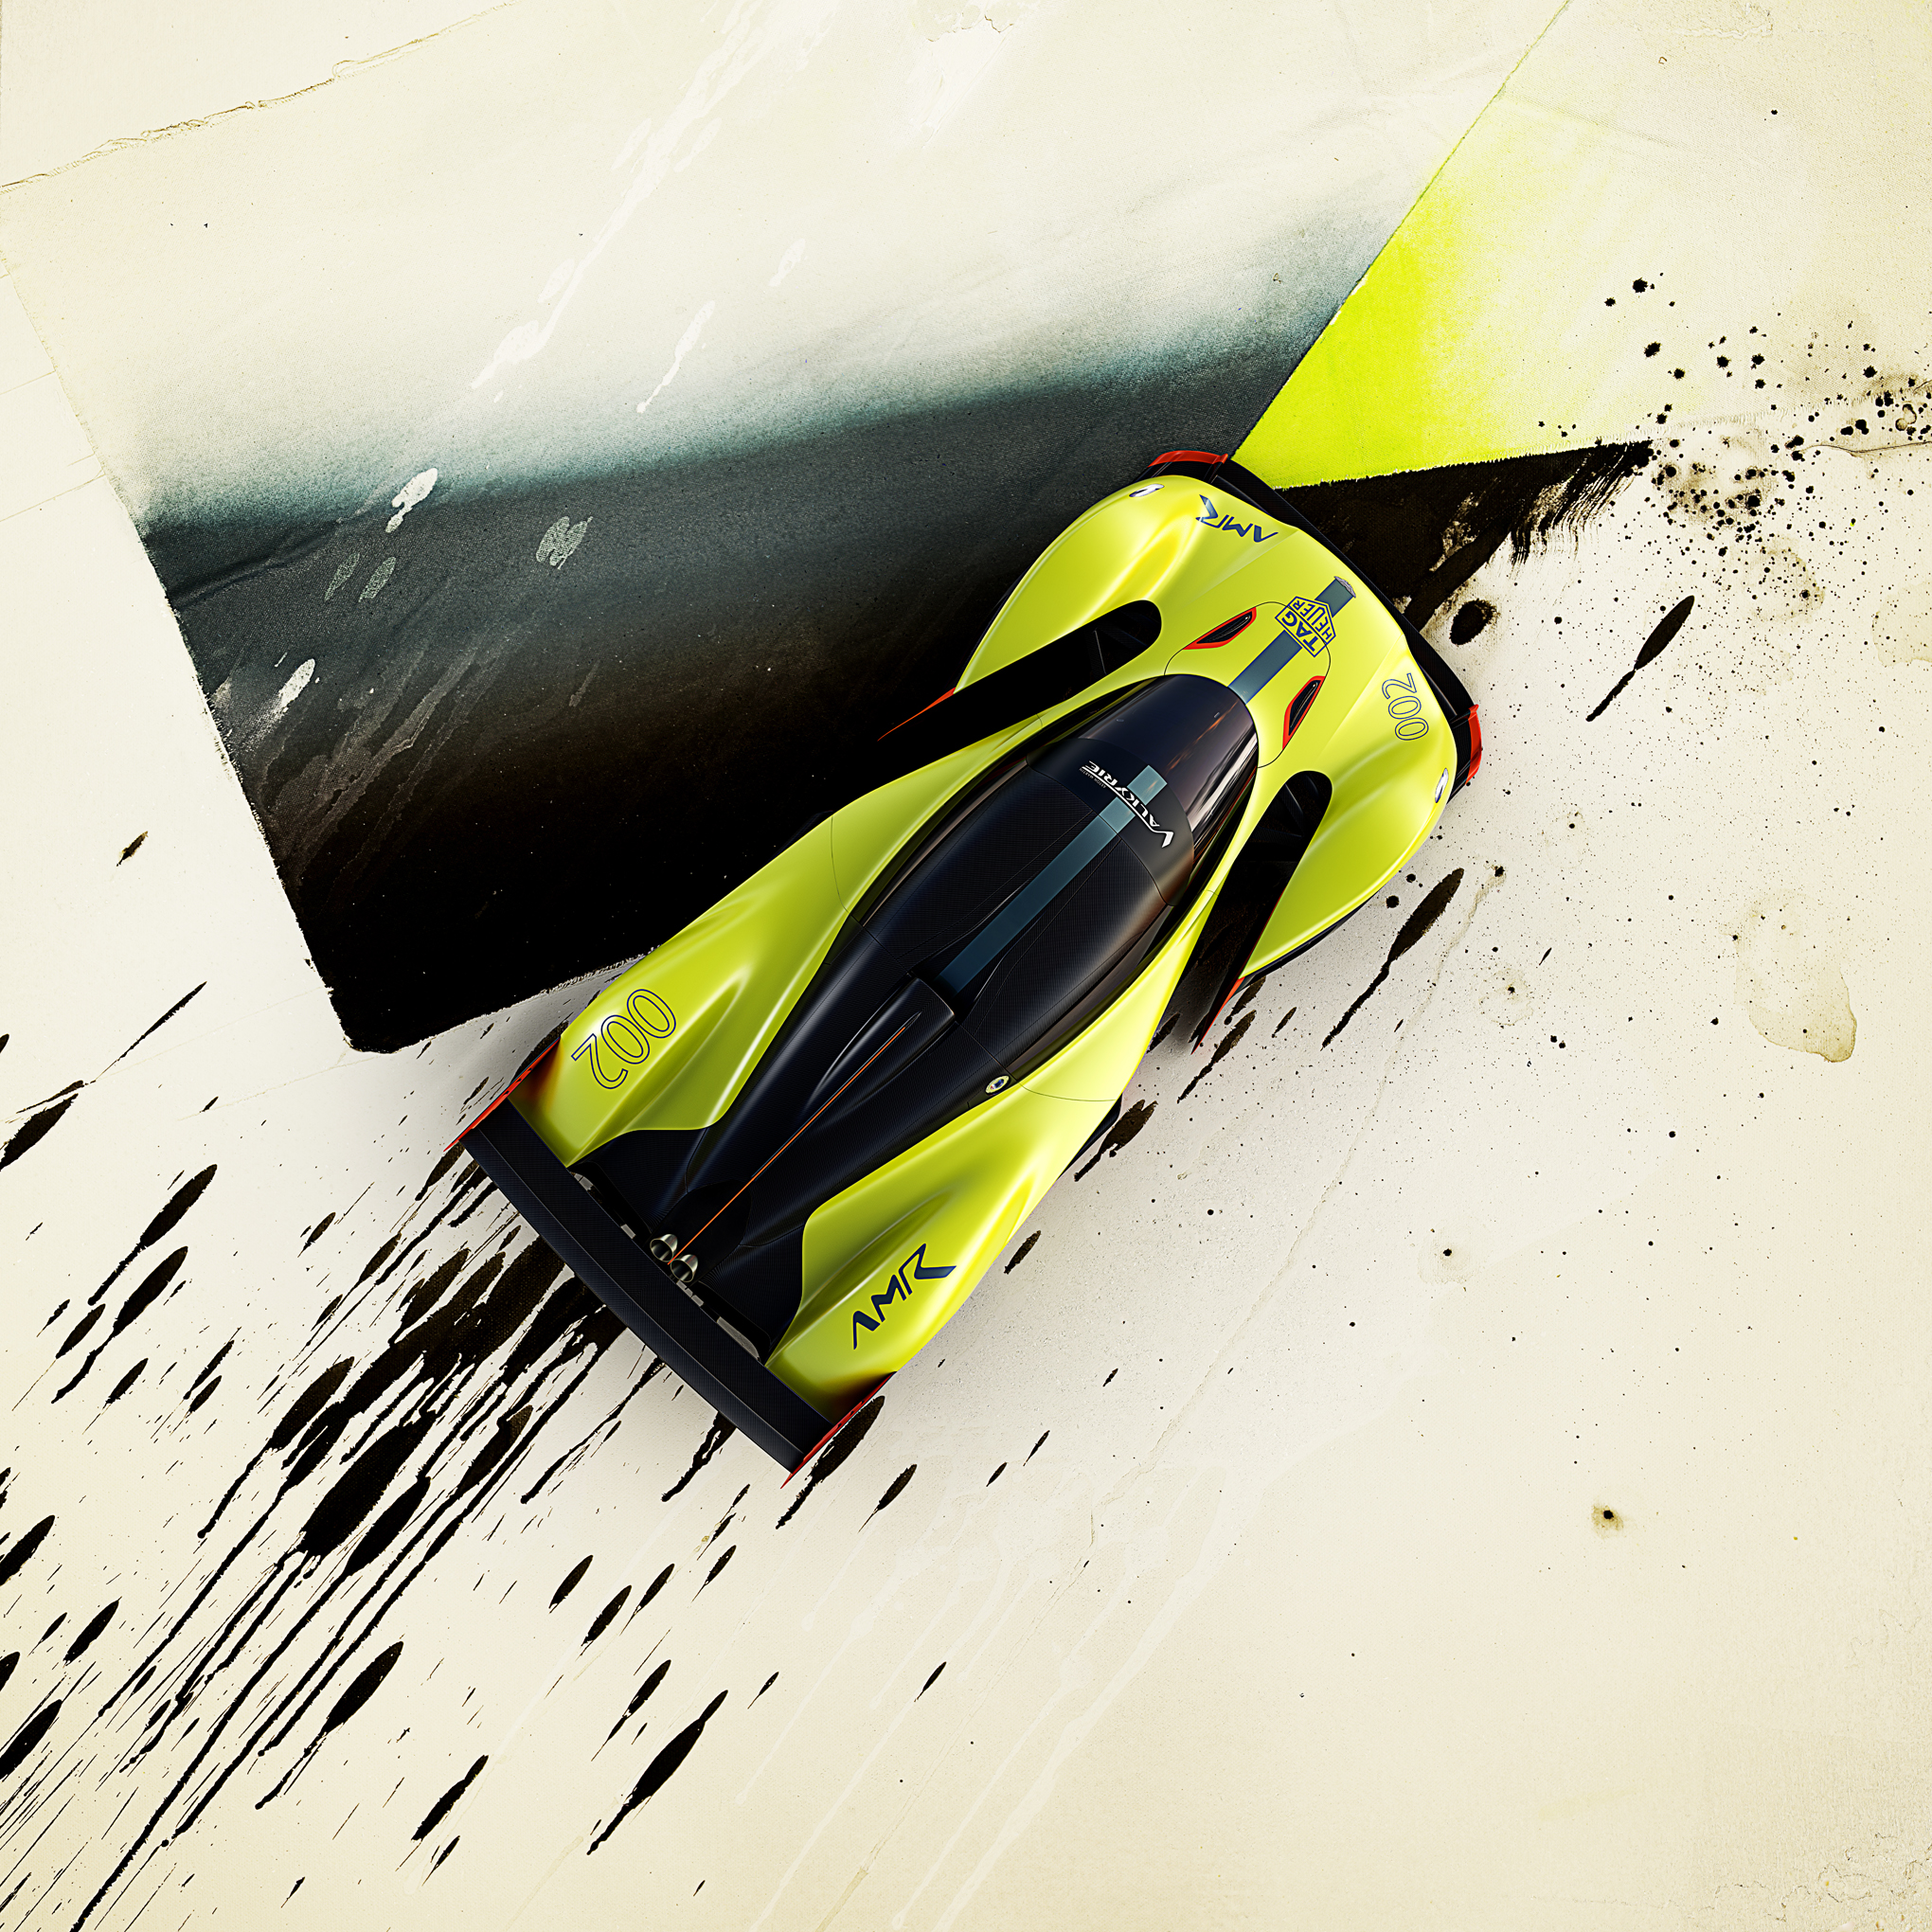 Aston Martin's New Hypercar Is An 1,100 Horsepower Asphalt